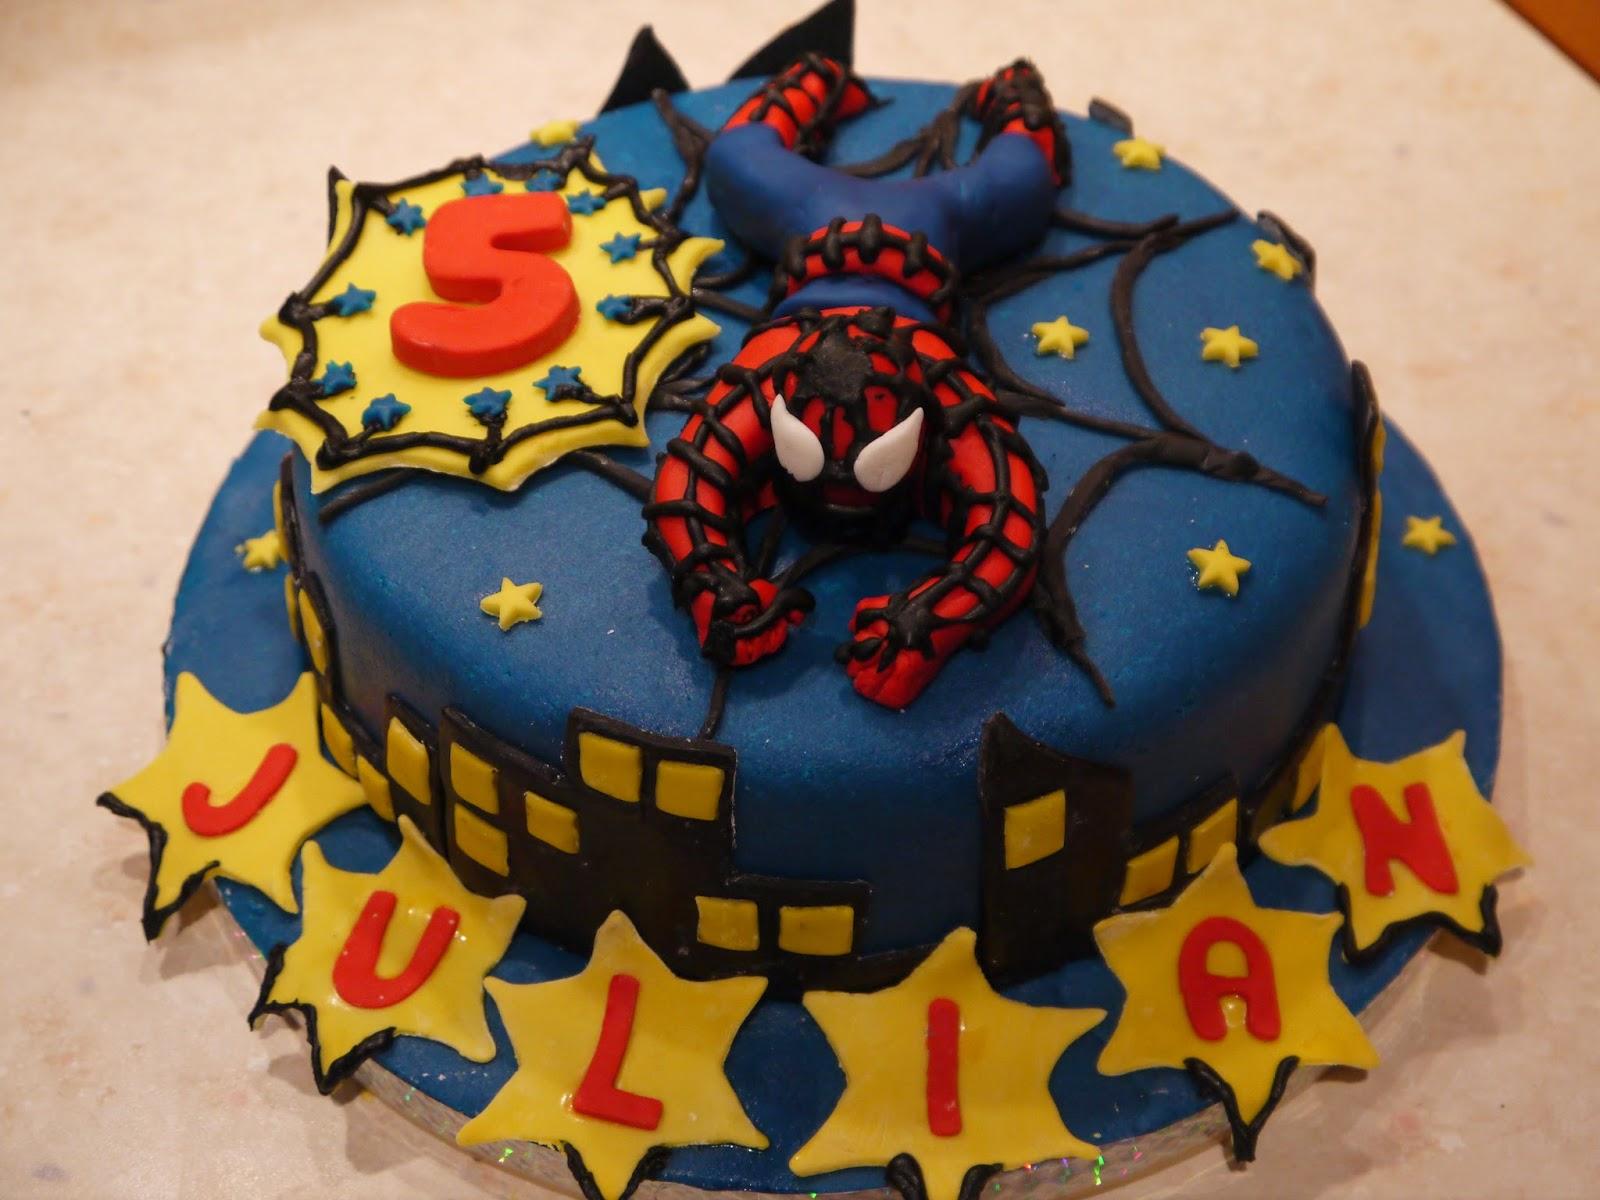 http://msfunnyhome.blogspot.de/2014/04/spiderman-torte-schokotorte-mit-schoko.html